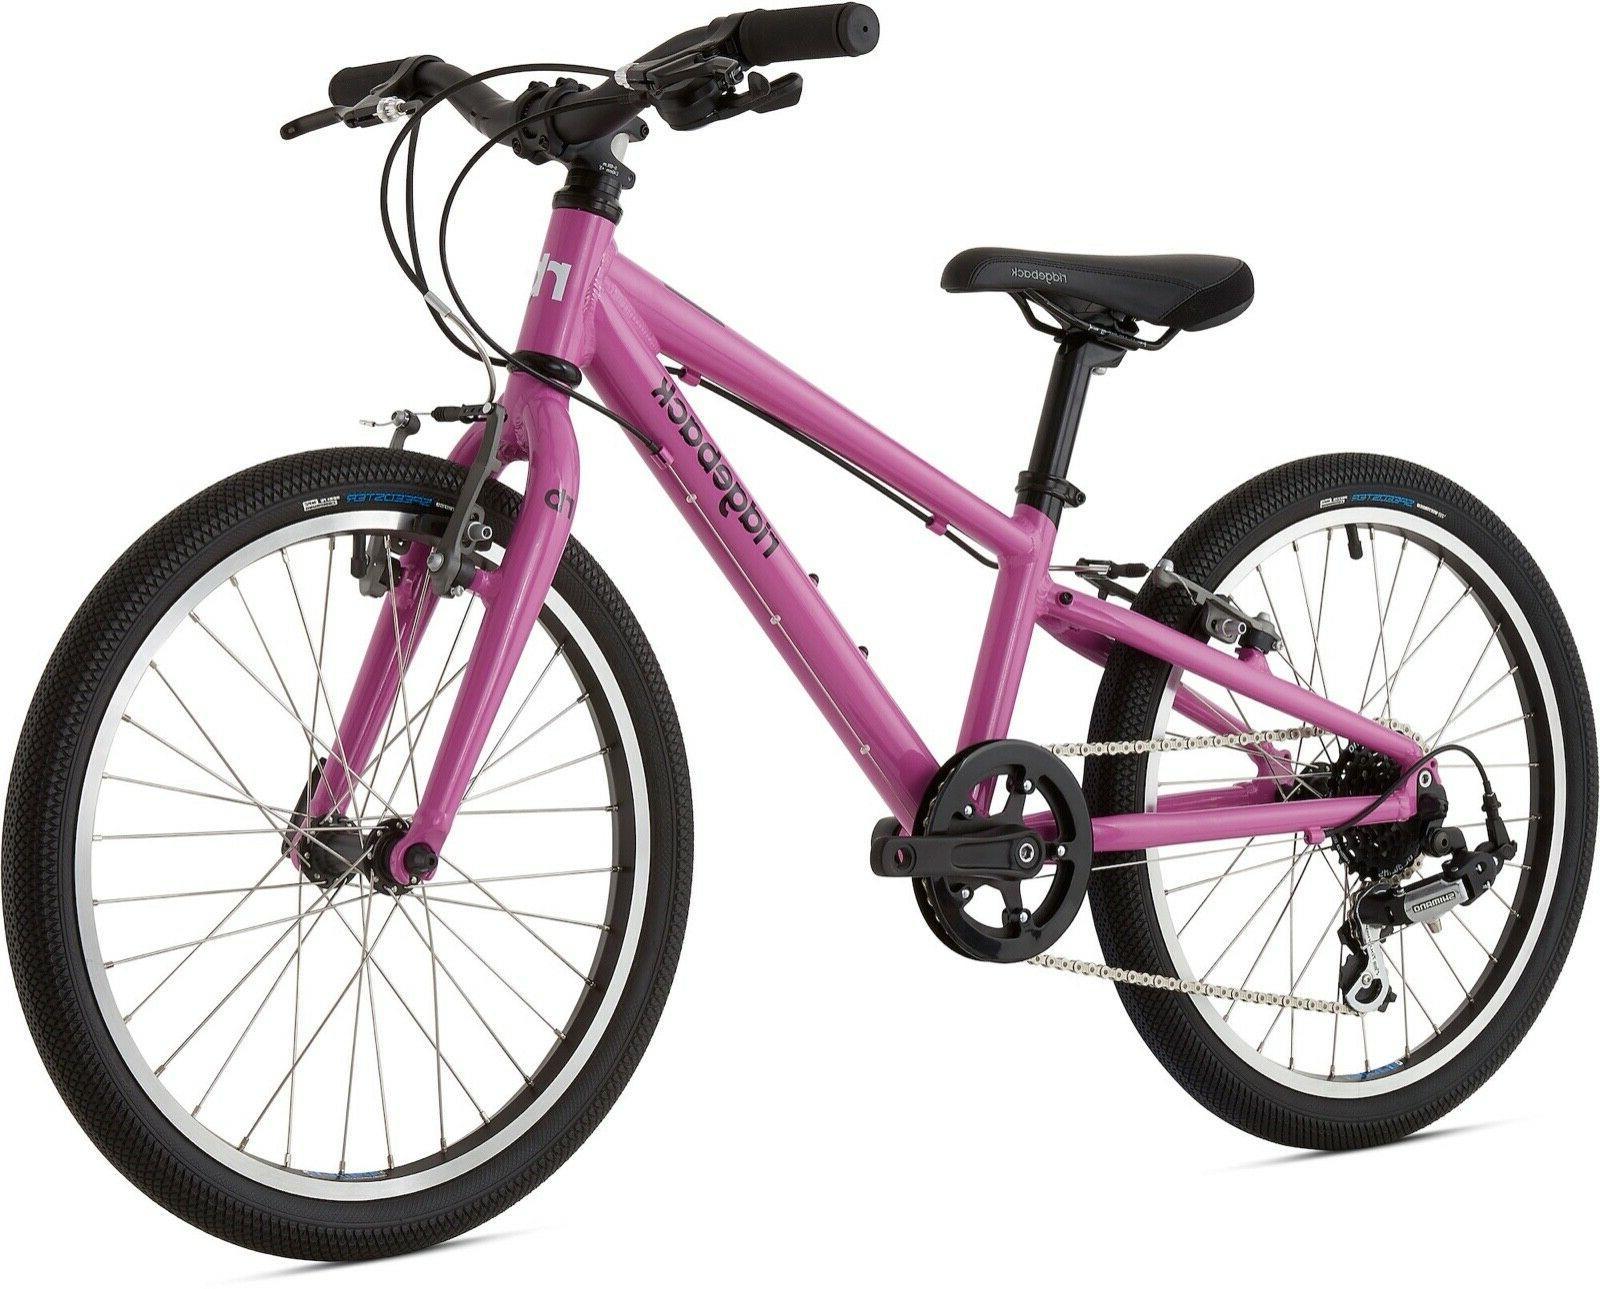 "Ridgeback Dimension 20"" Bike WeeBikeShop"